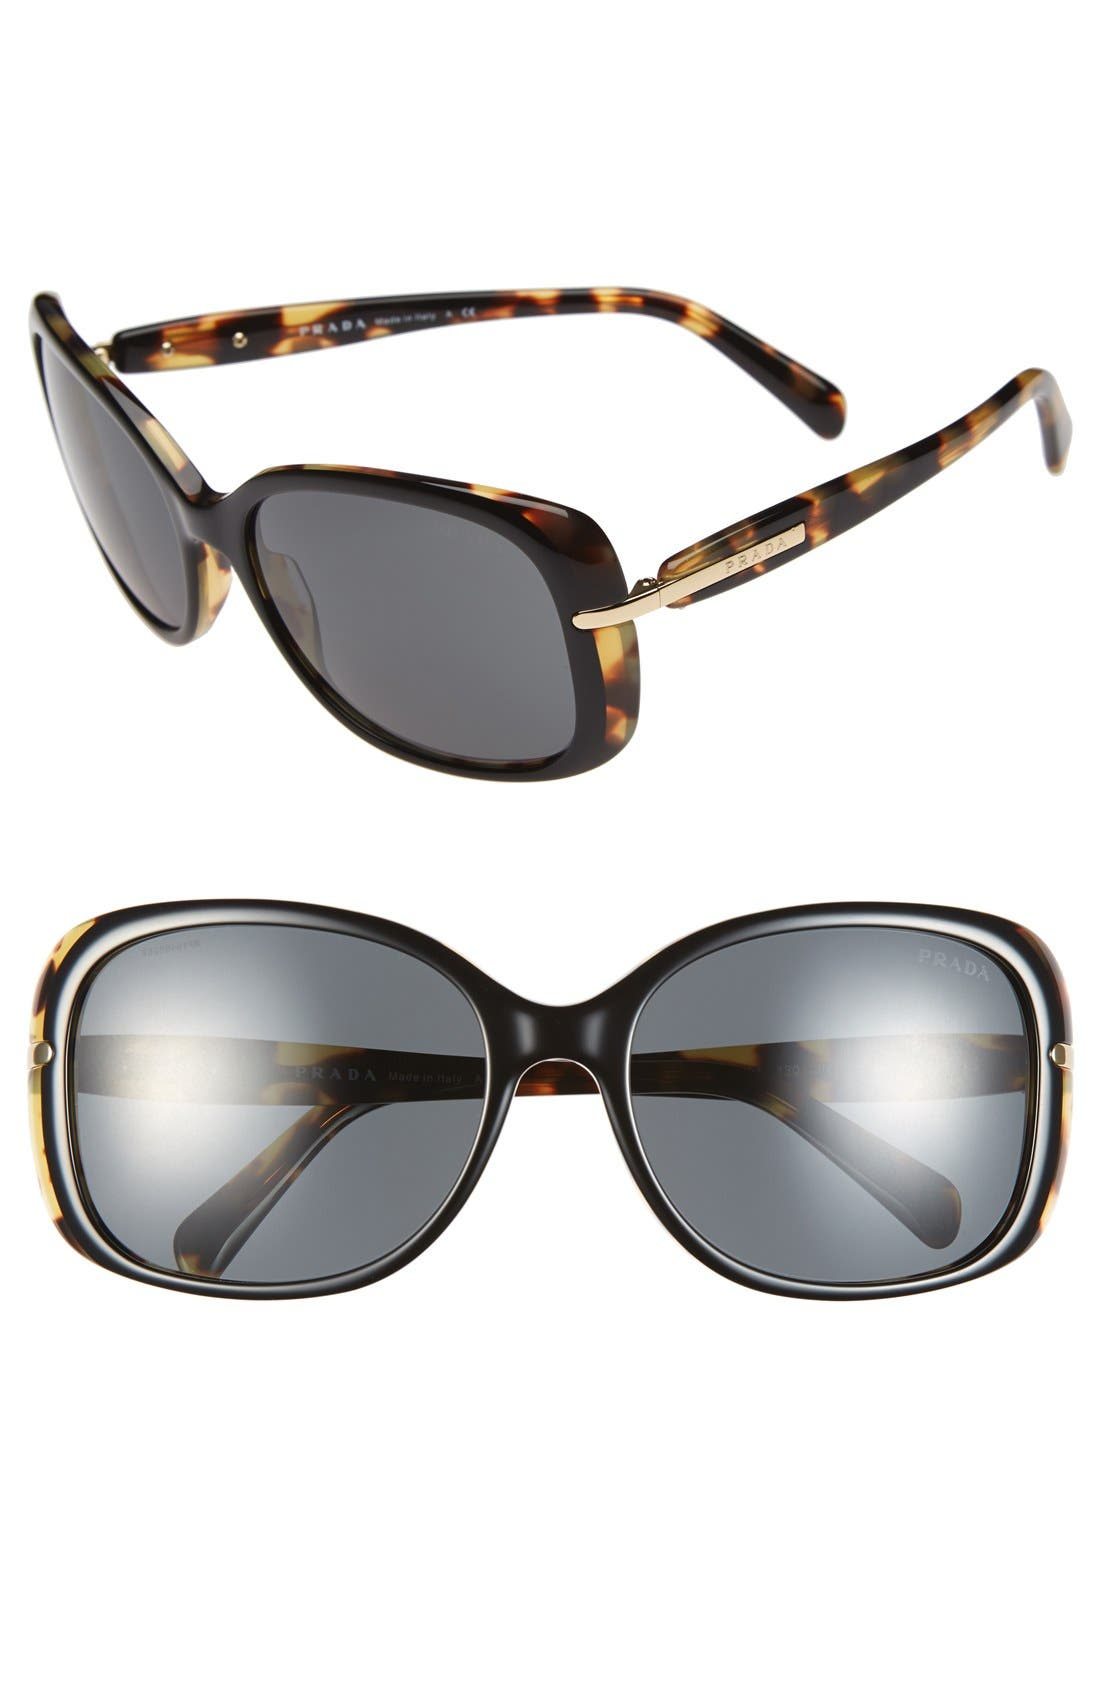 Prada 57mm Retro Sunglasses